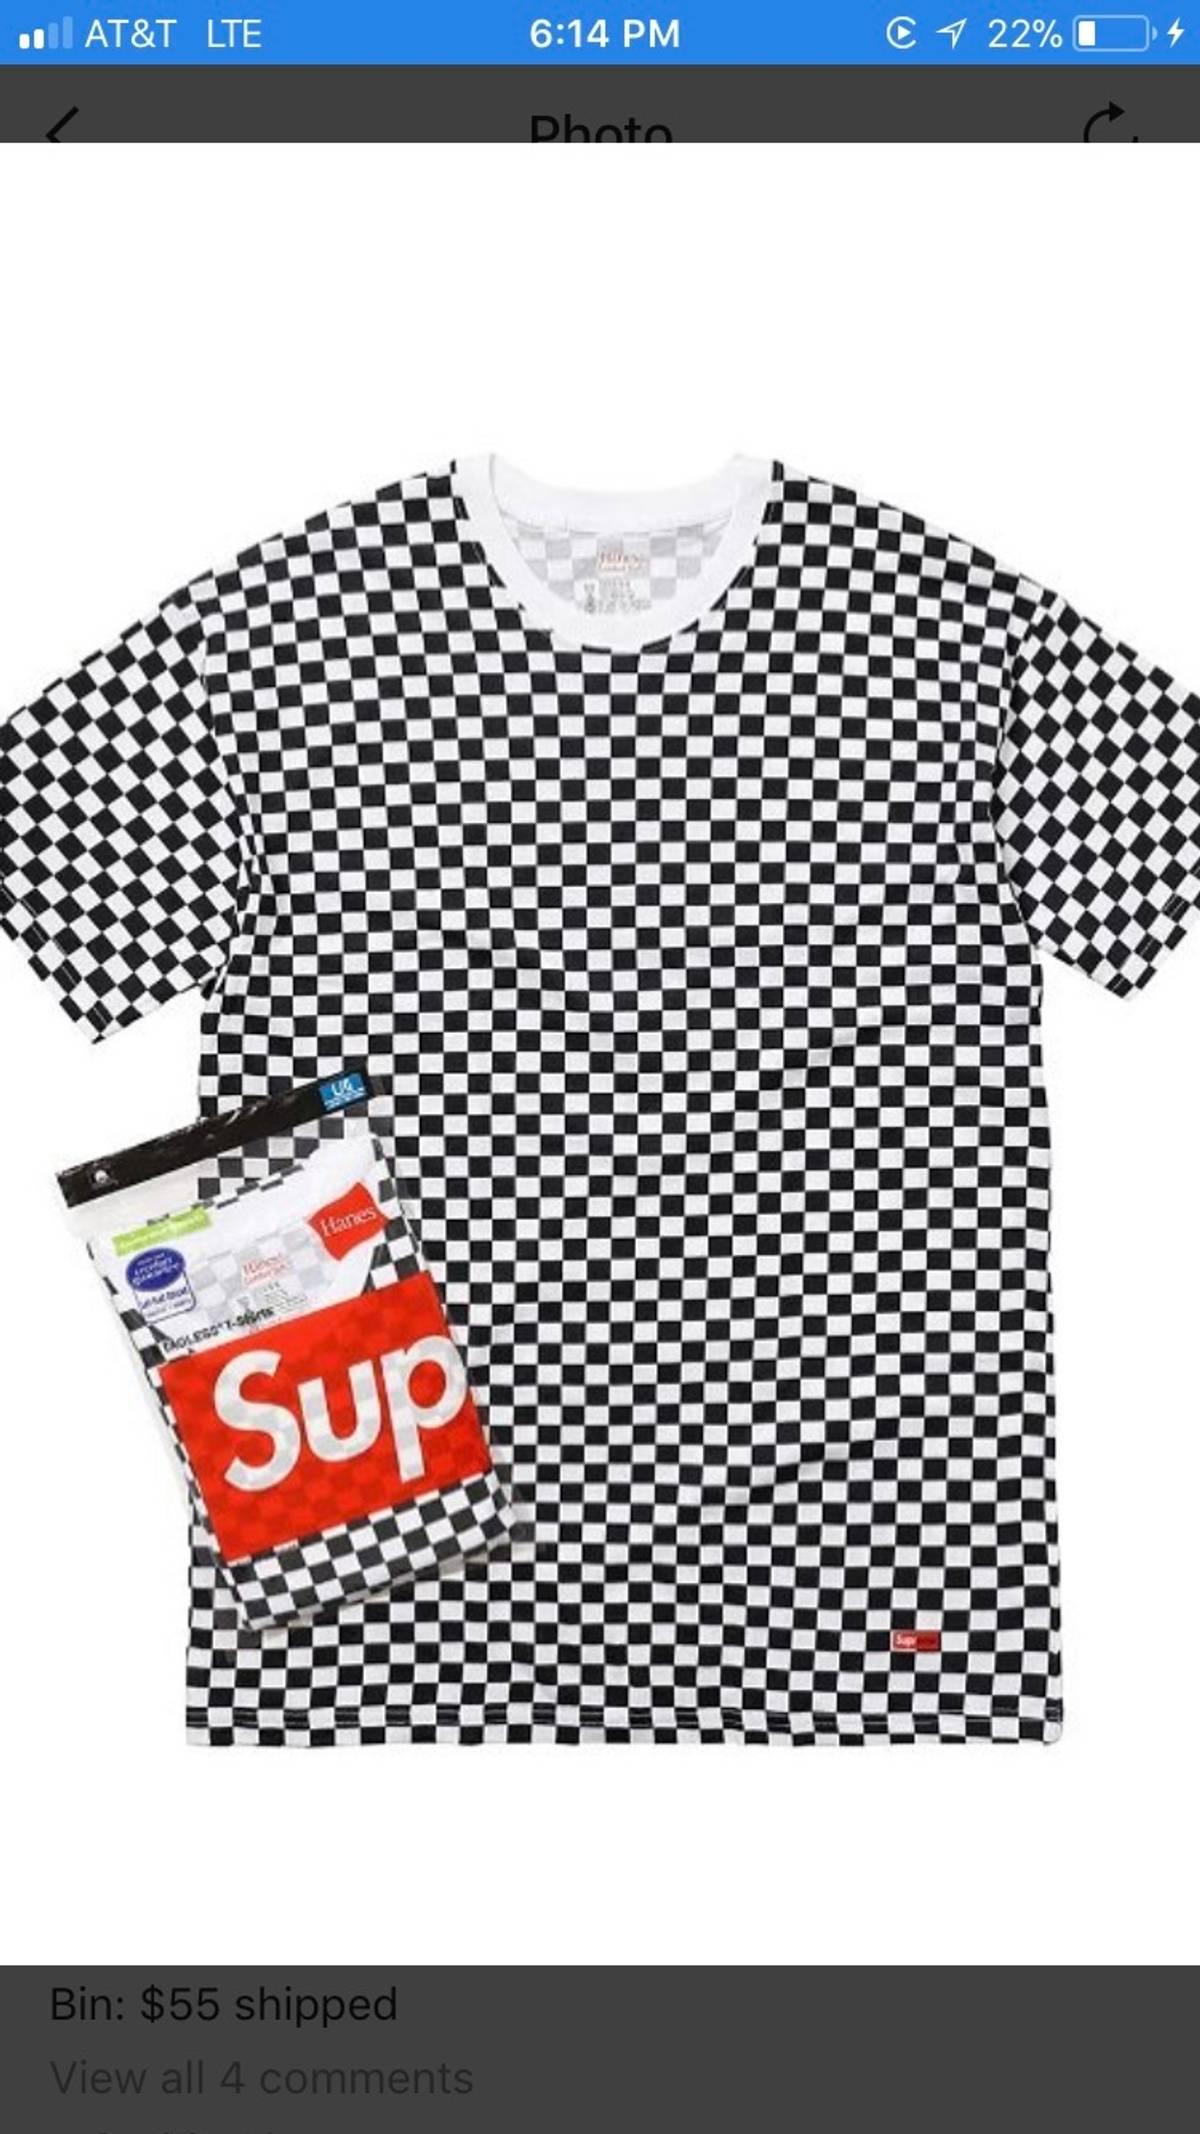 70d1e09be9de Supreme Supreme Checkered Shirt (comes With 2 Shirts)   Grailed